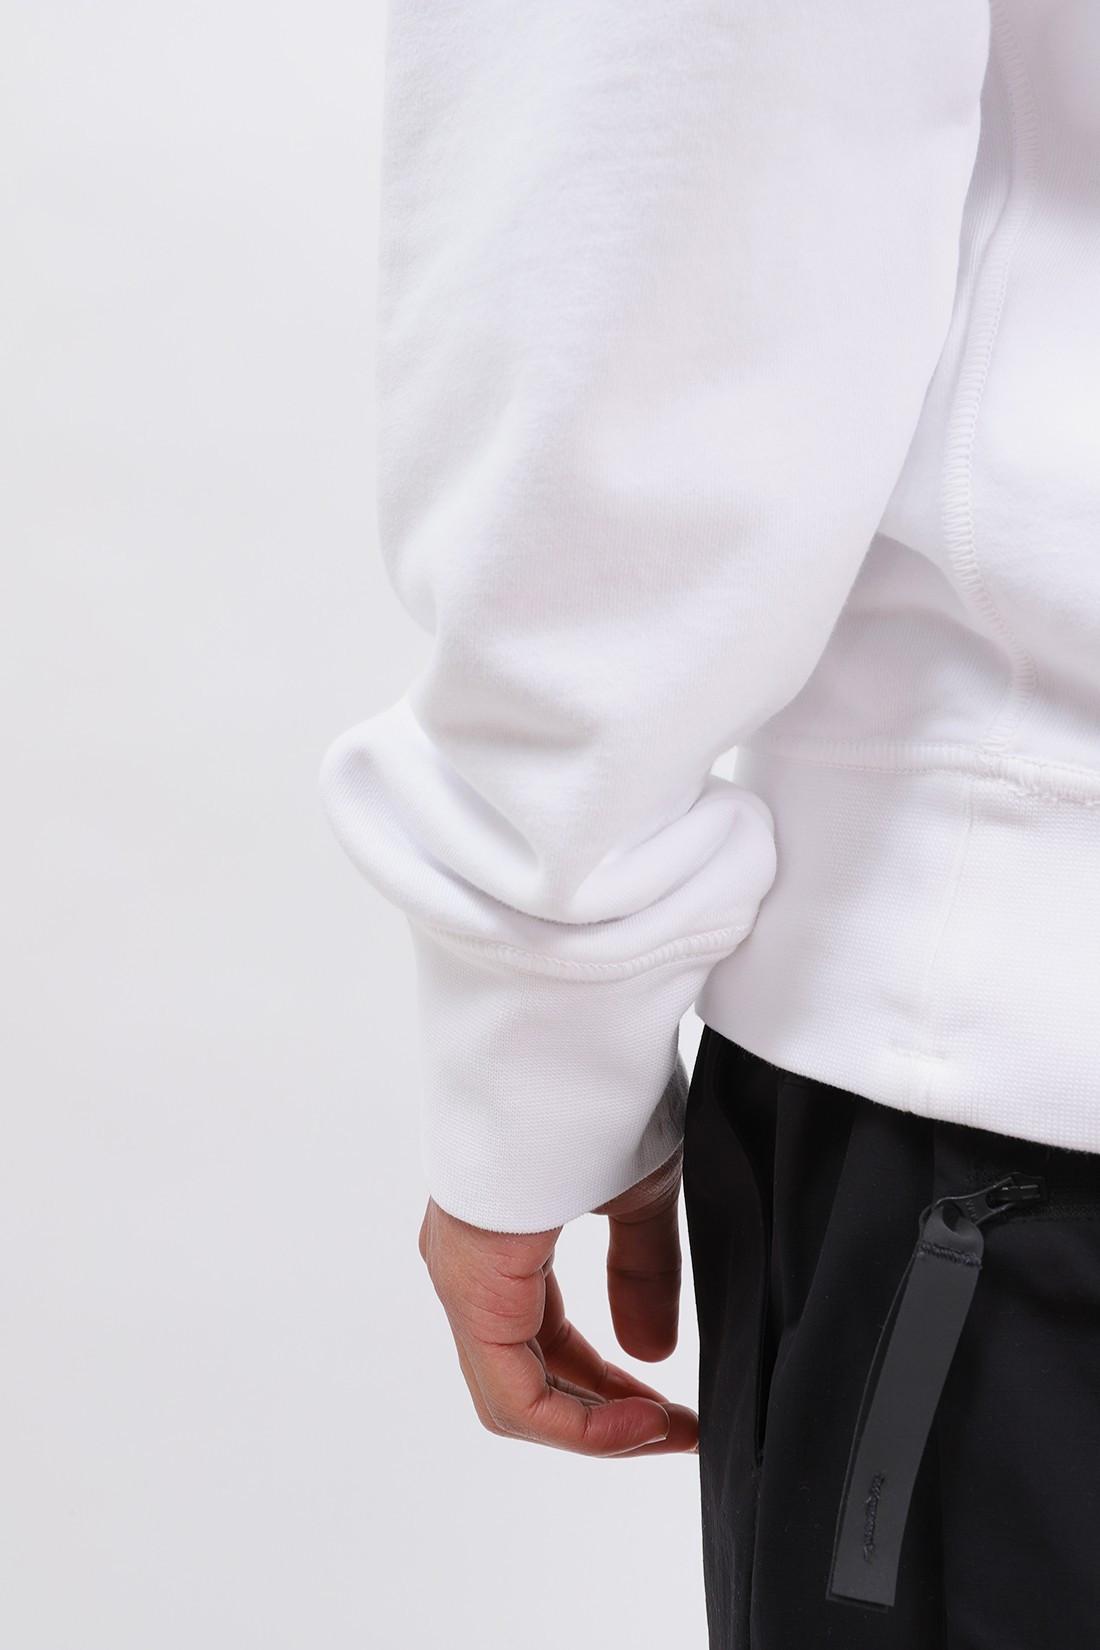 STONE ISLAND / 63051 crewneck sweater v0001 Bianco